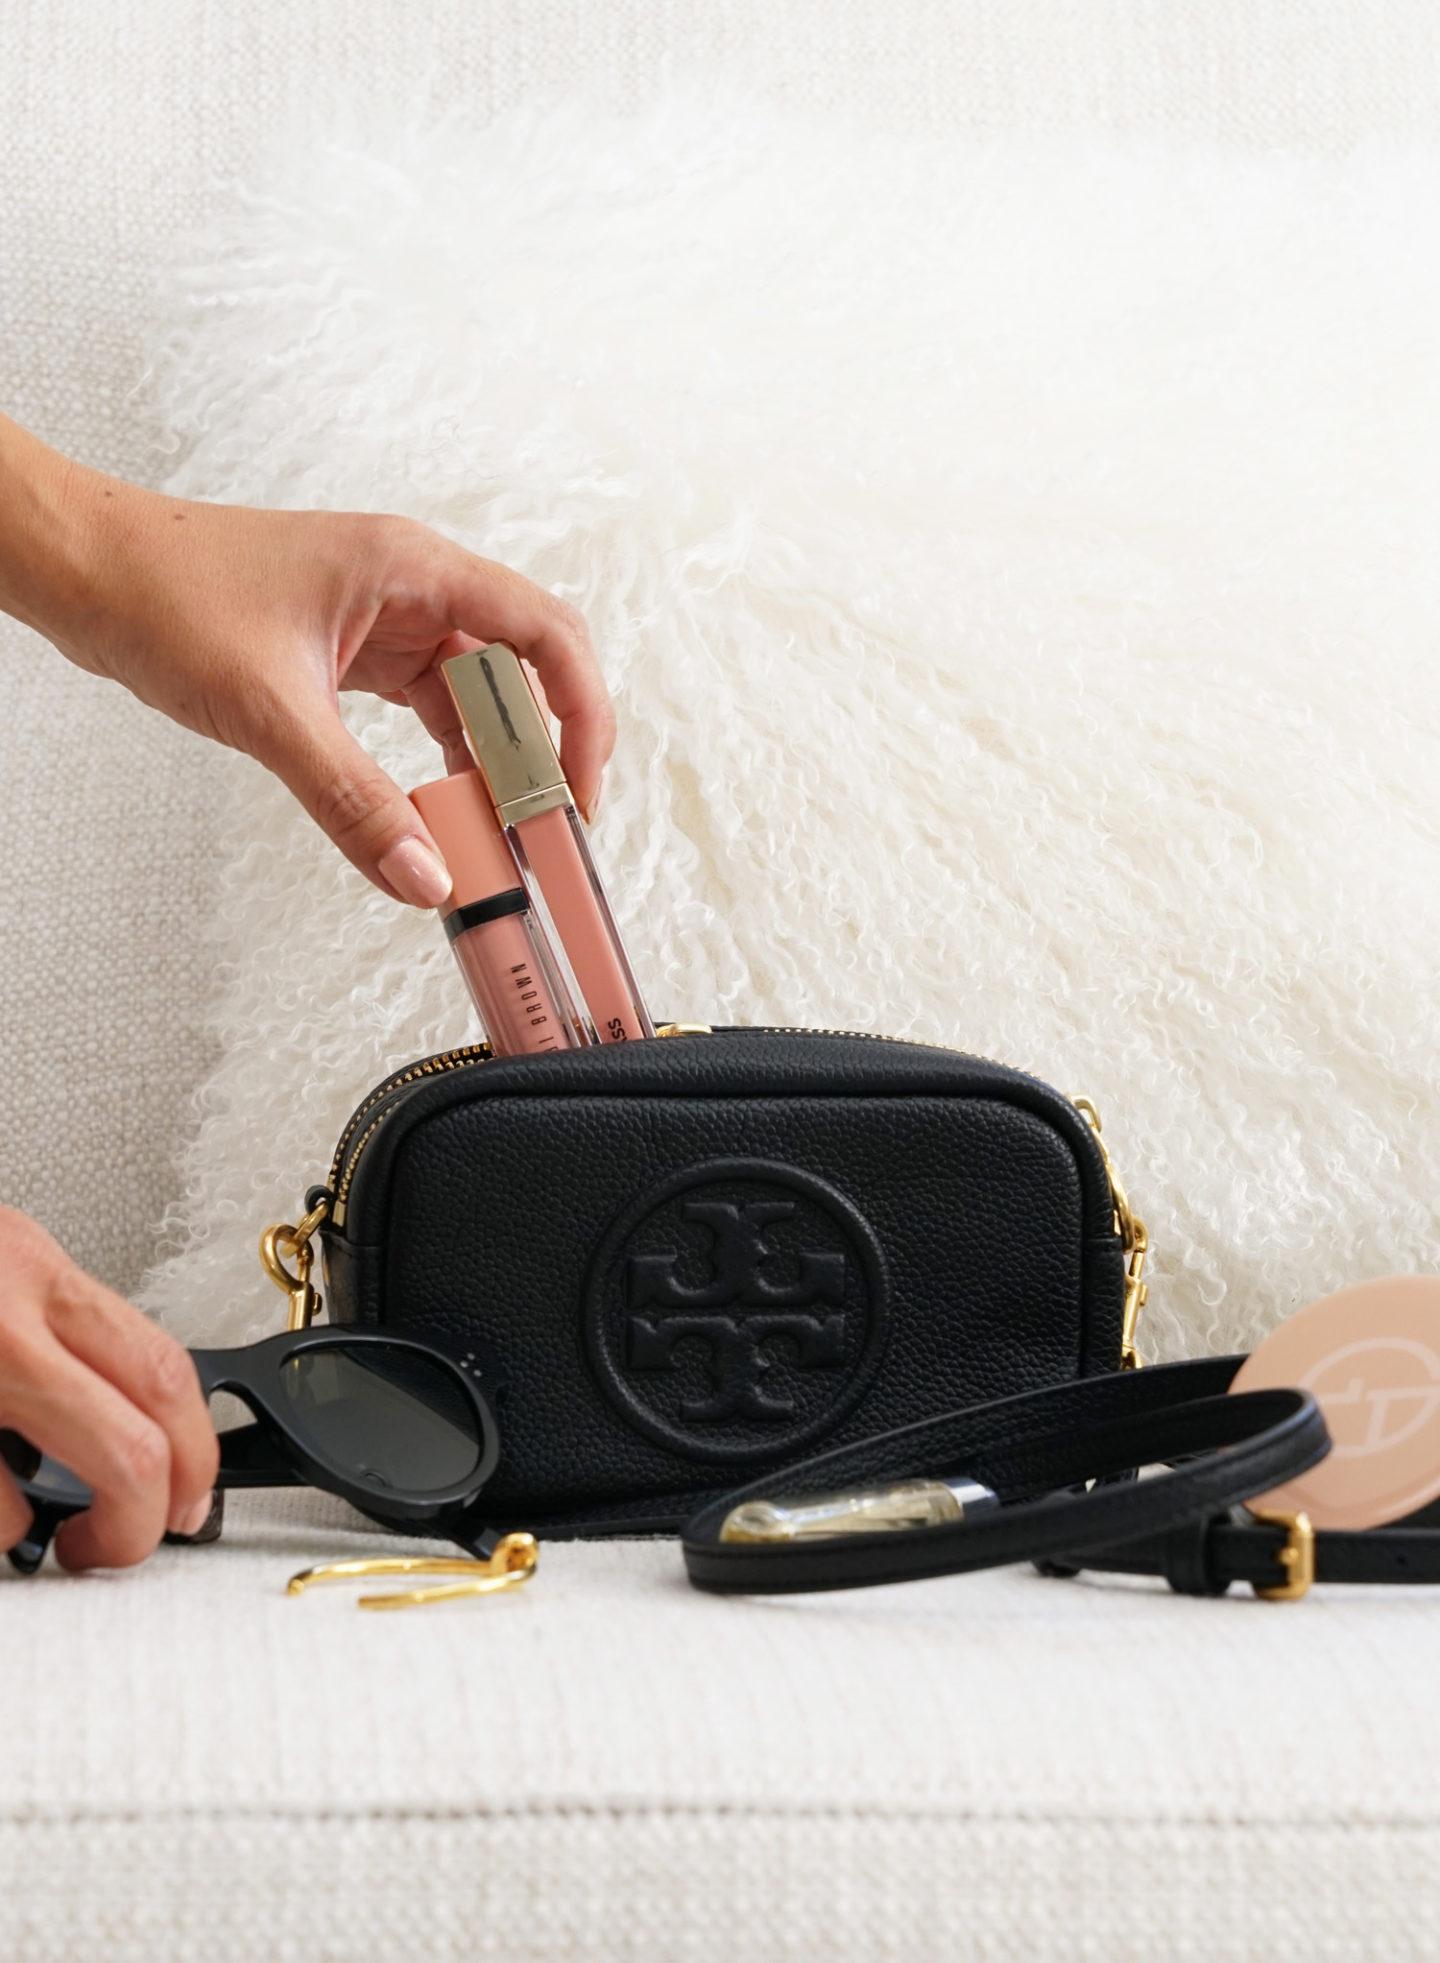 Mini sac en cuir Tory Burch Perry Bombe | Le look book beauté